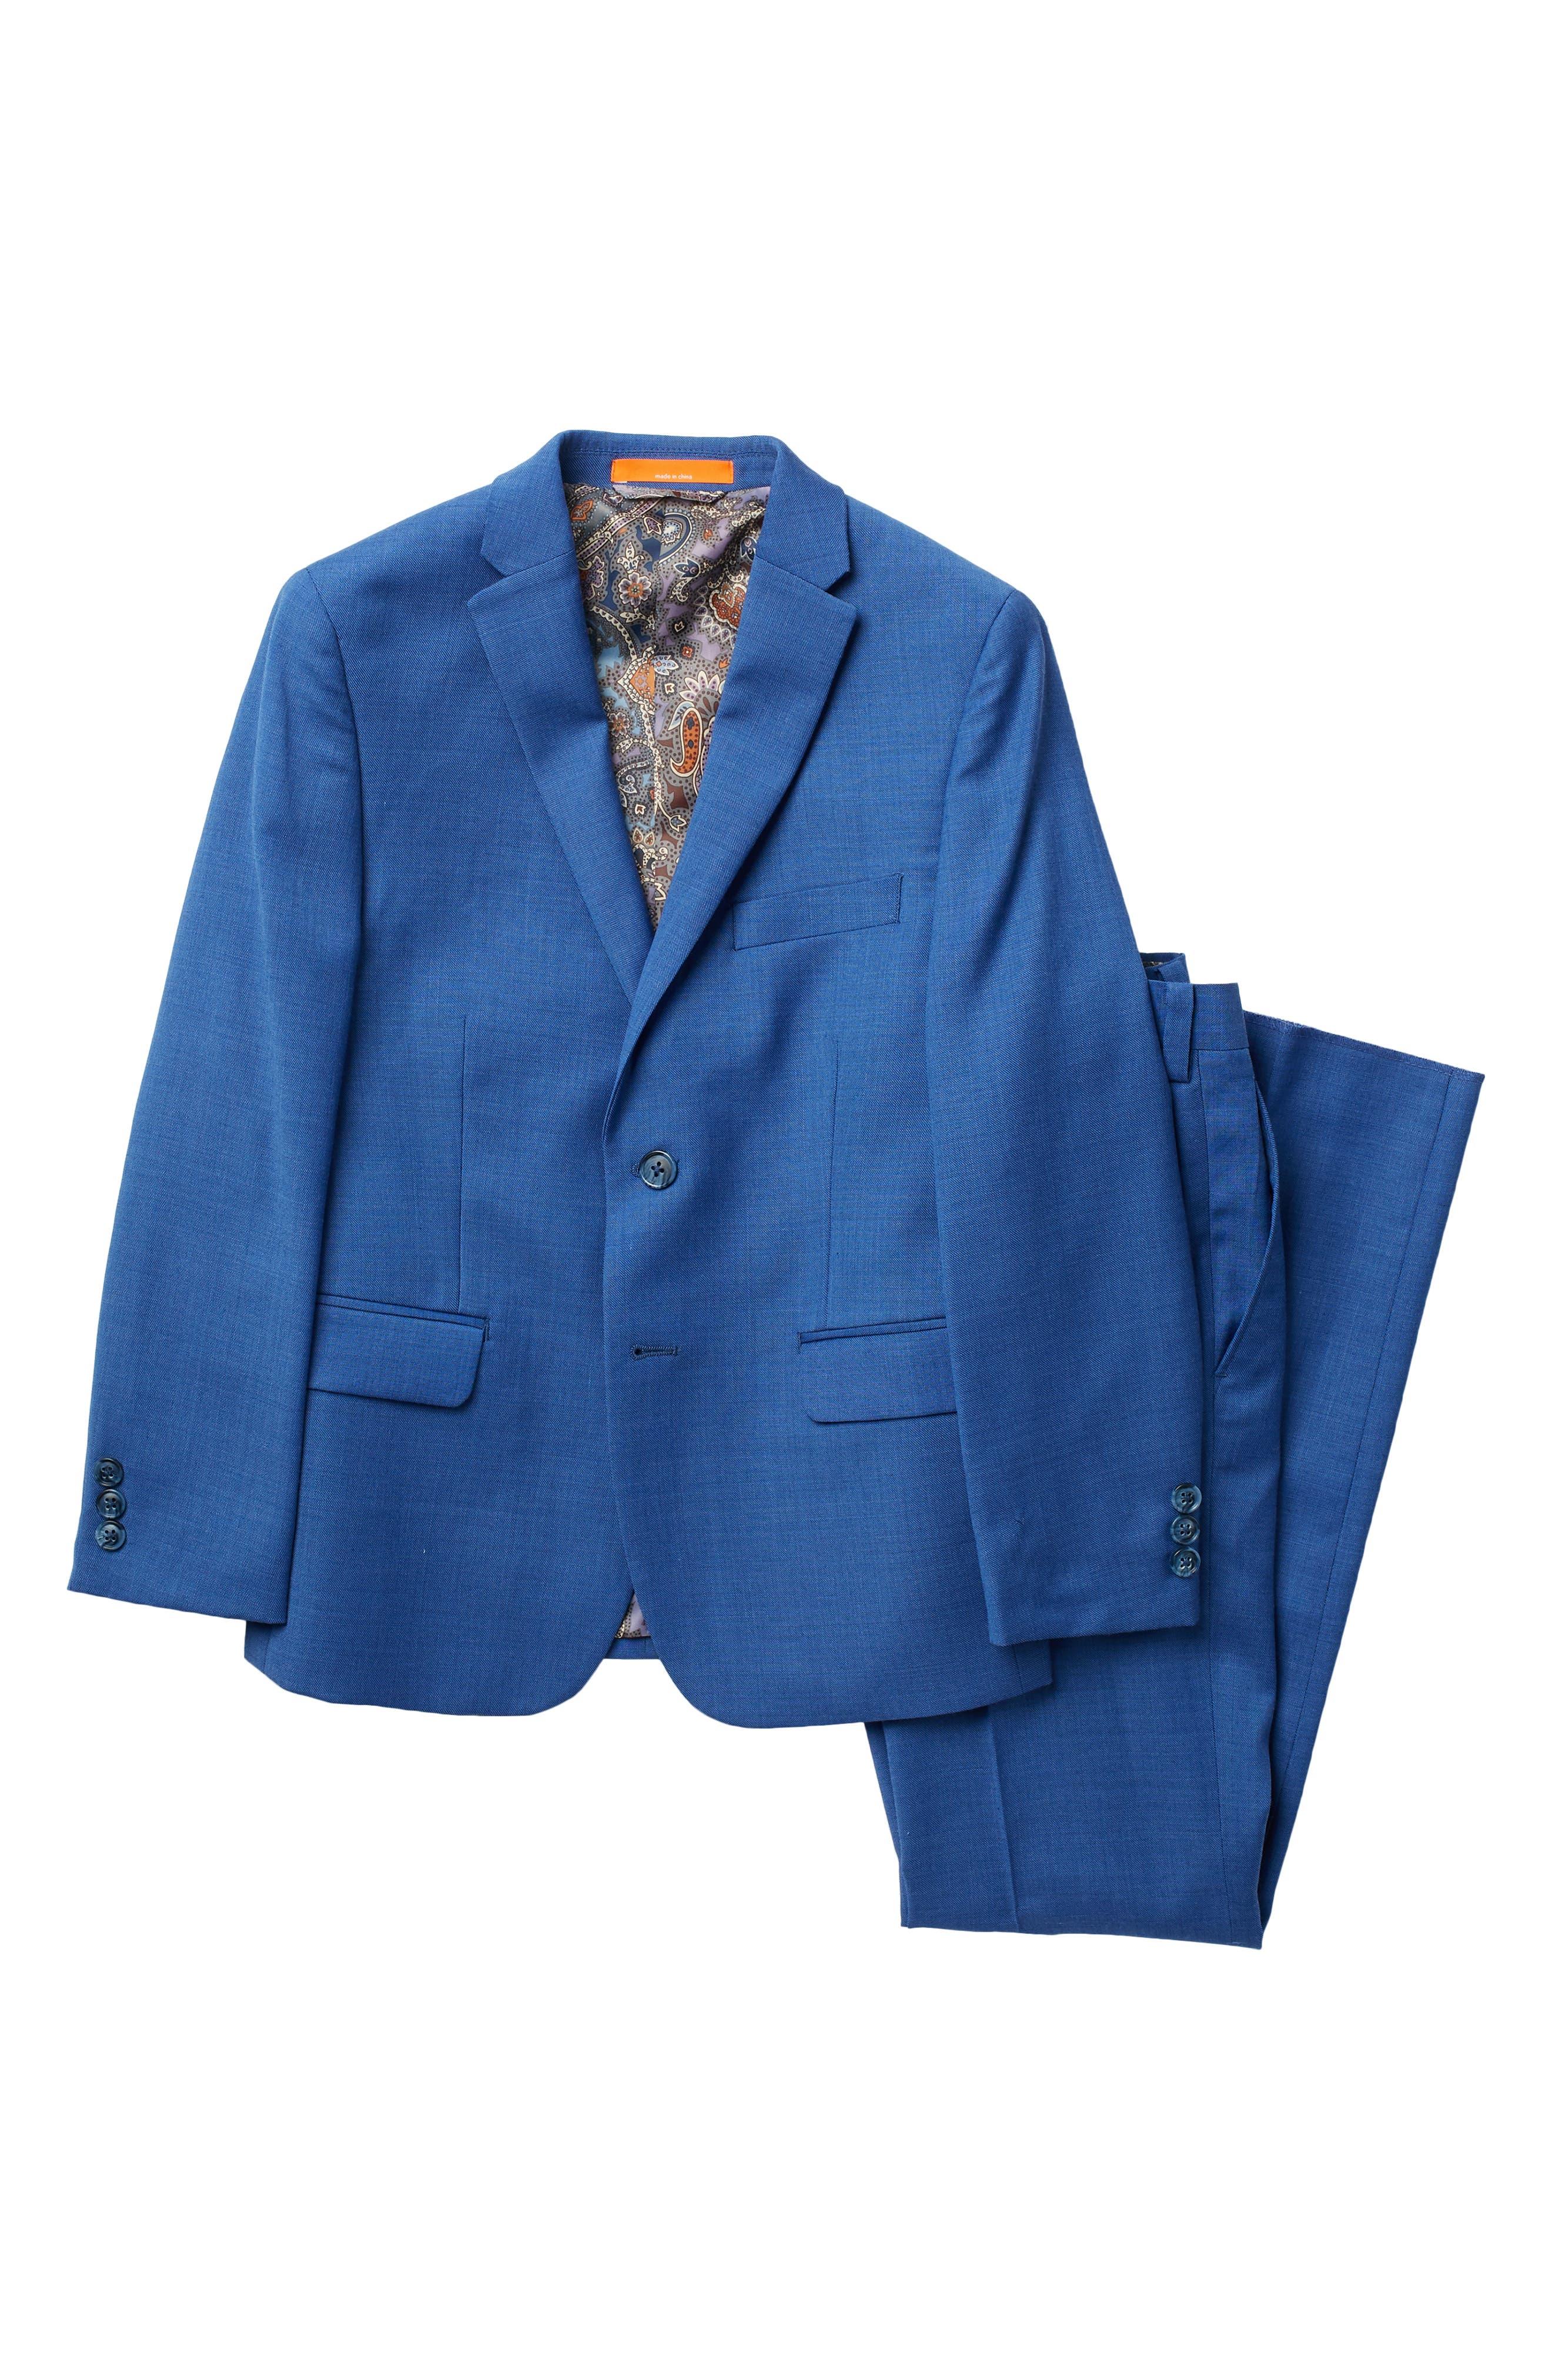 Image of Tallia Sharkskin Brushed Natural Suit